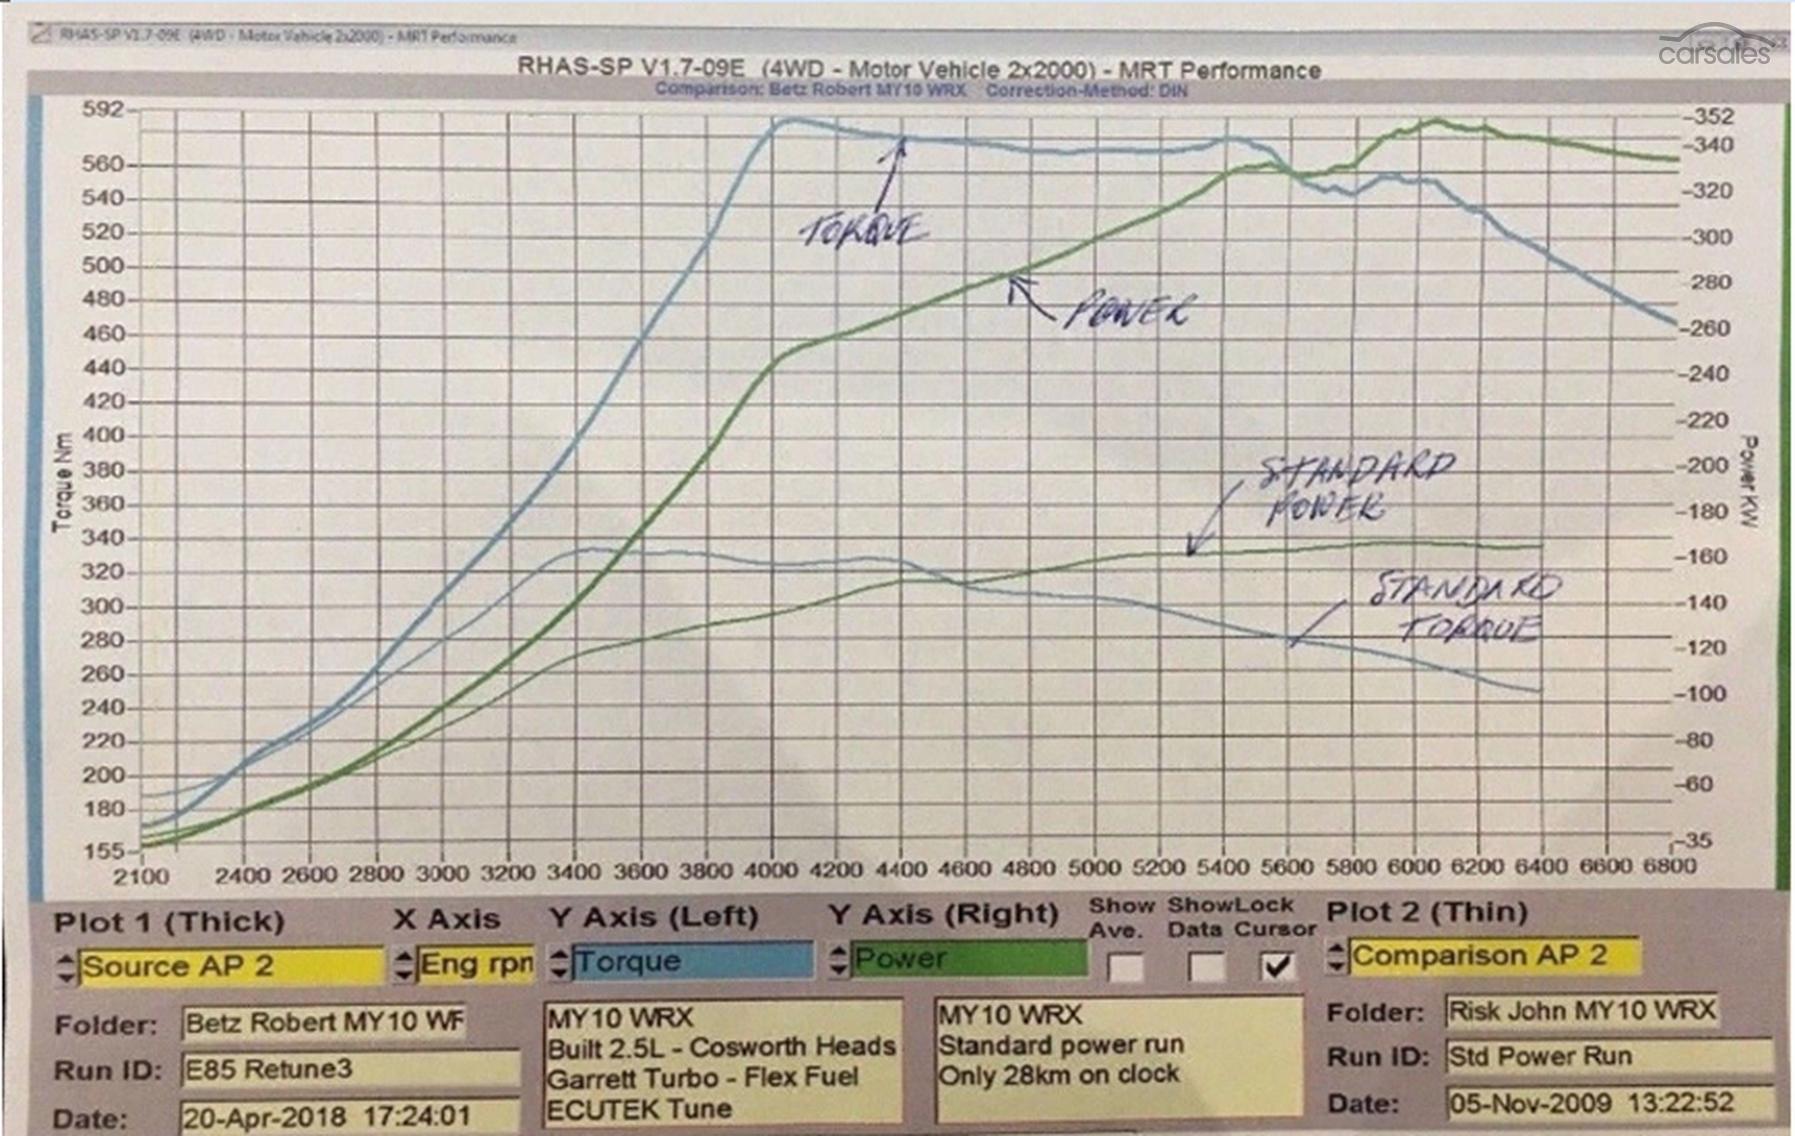 2010 Subaru Impreza Wrx G3 Manual Awd My10 Sse Ad 5535092 Wiring Schematics For An Au Quotpremium Sound Systemquot Australian Ford